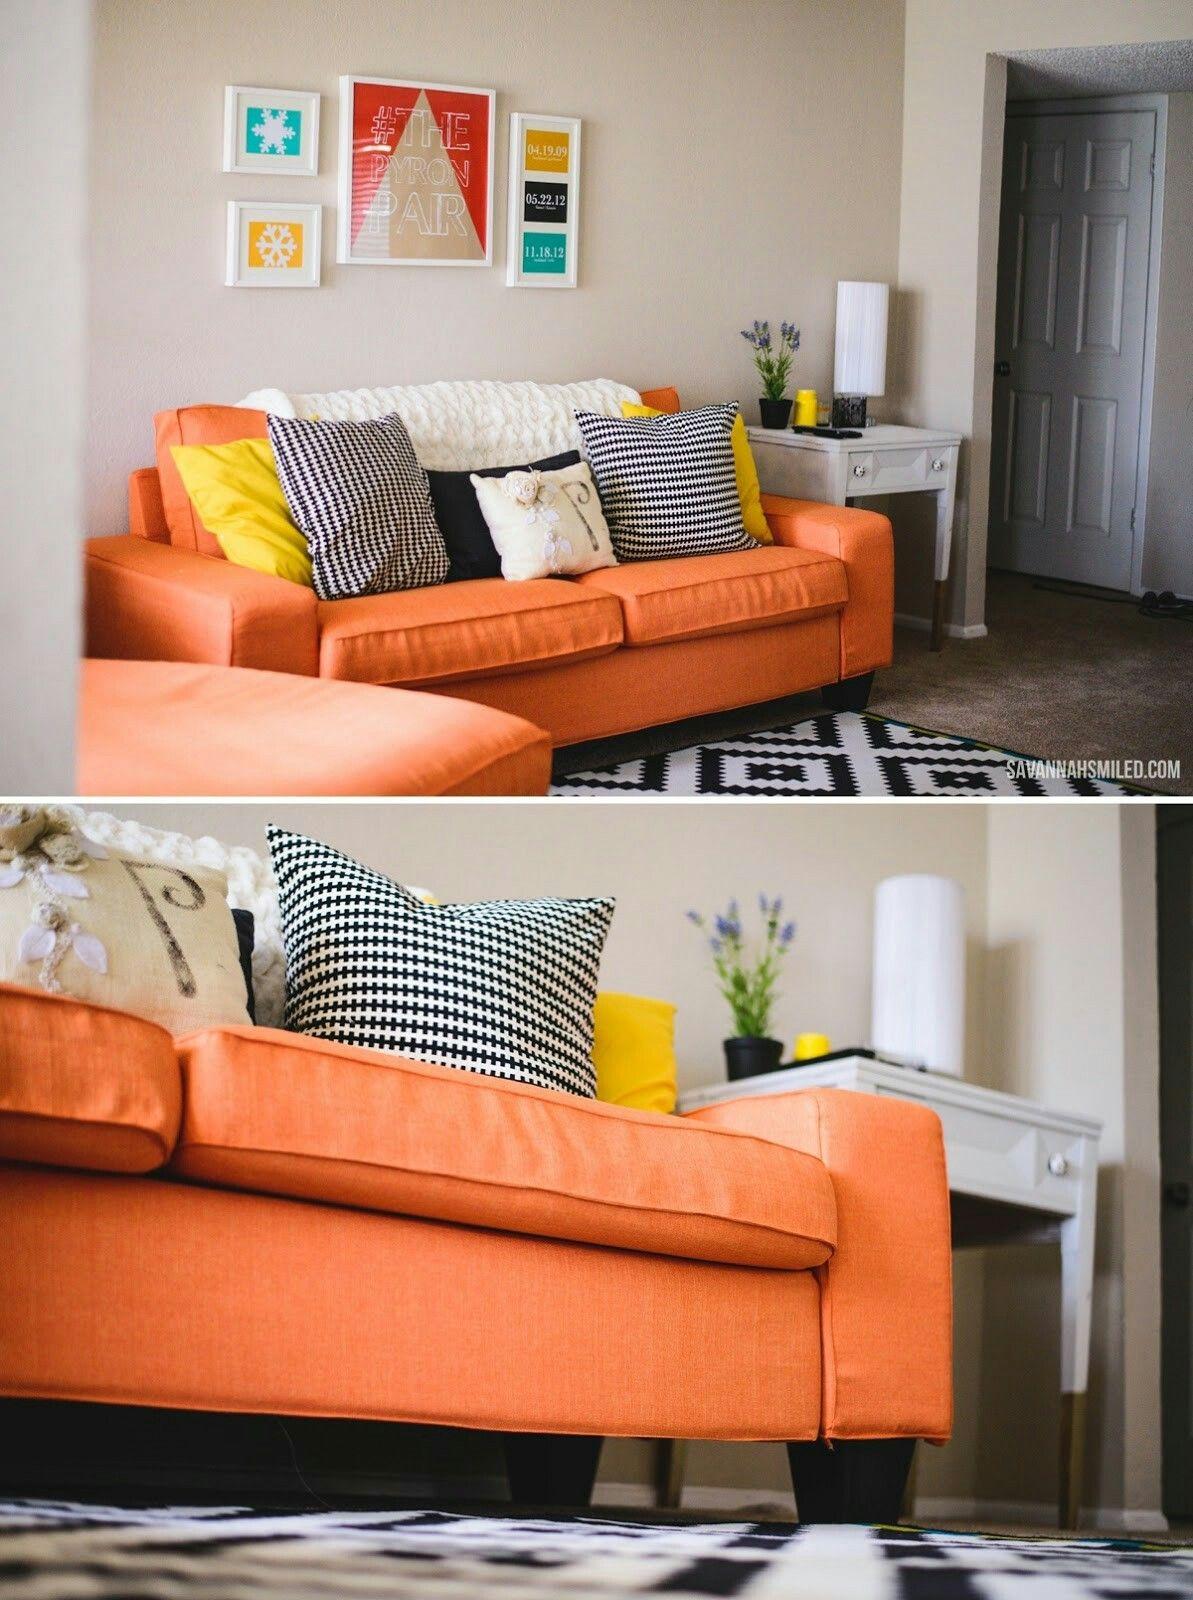 Pin By Heidi Love On Un Pan Bajo El Brazo Orange Sofa Ikea Sofa Bed Small Couches Living Room